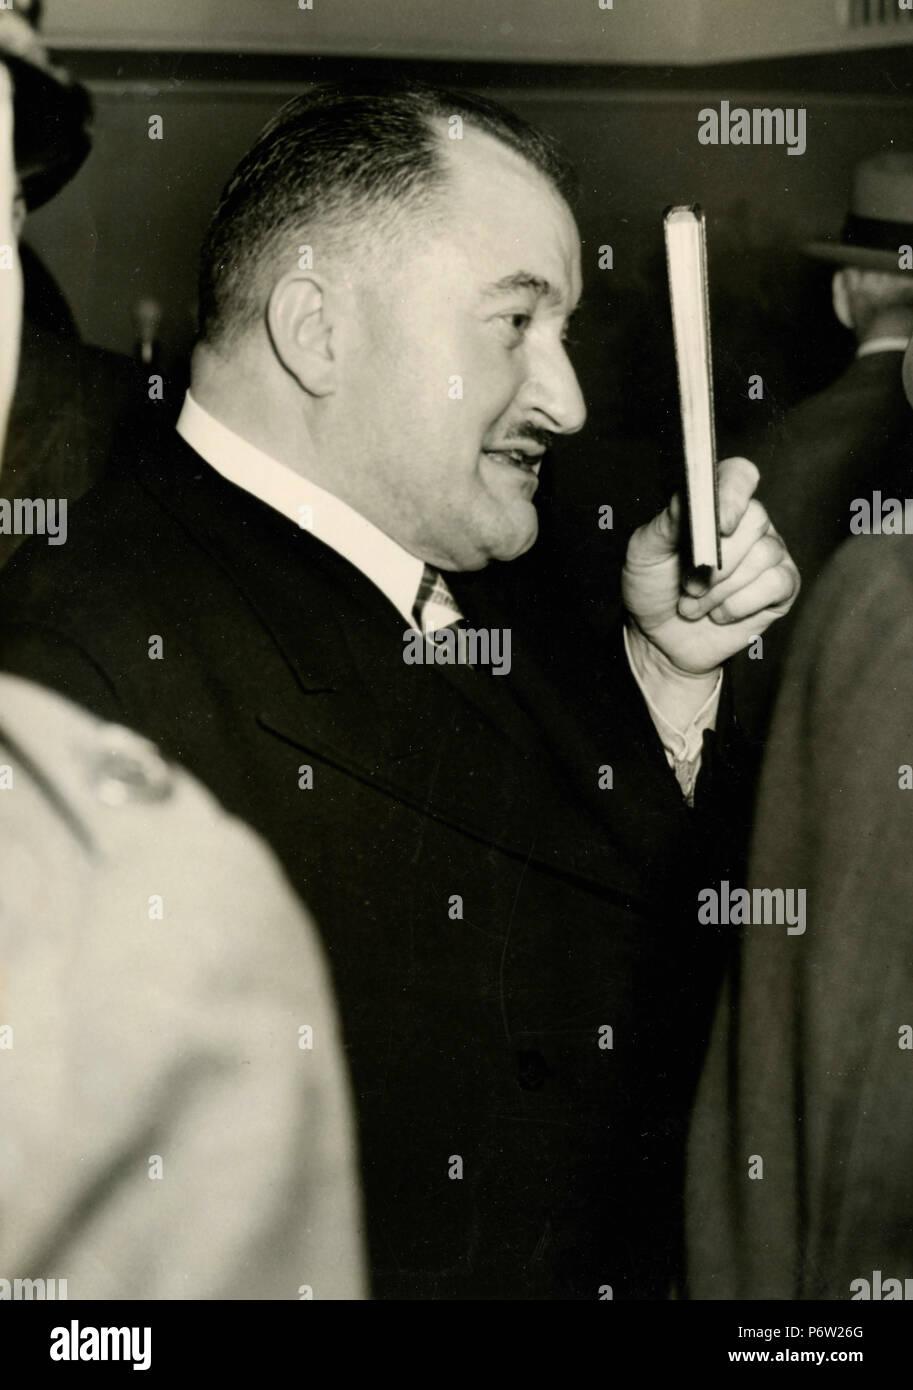 Grover Cleveland Bergdoll, World War Draft Dodger, NY, USA 1939 - Stock Image